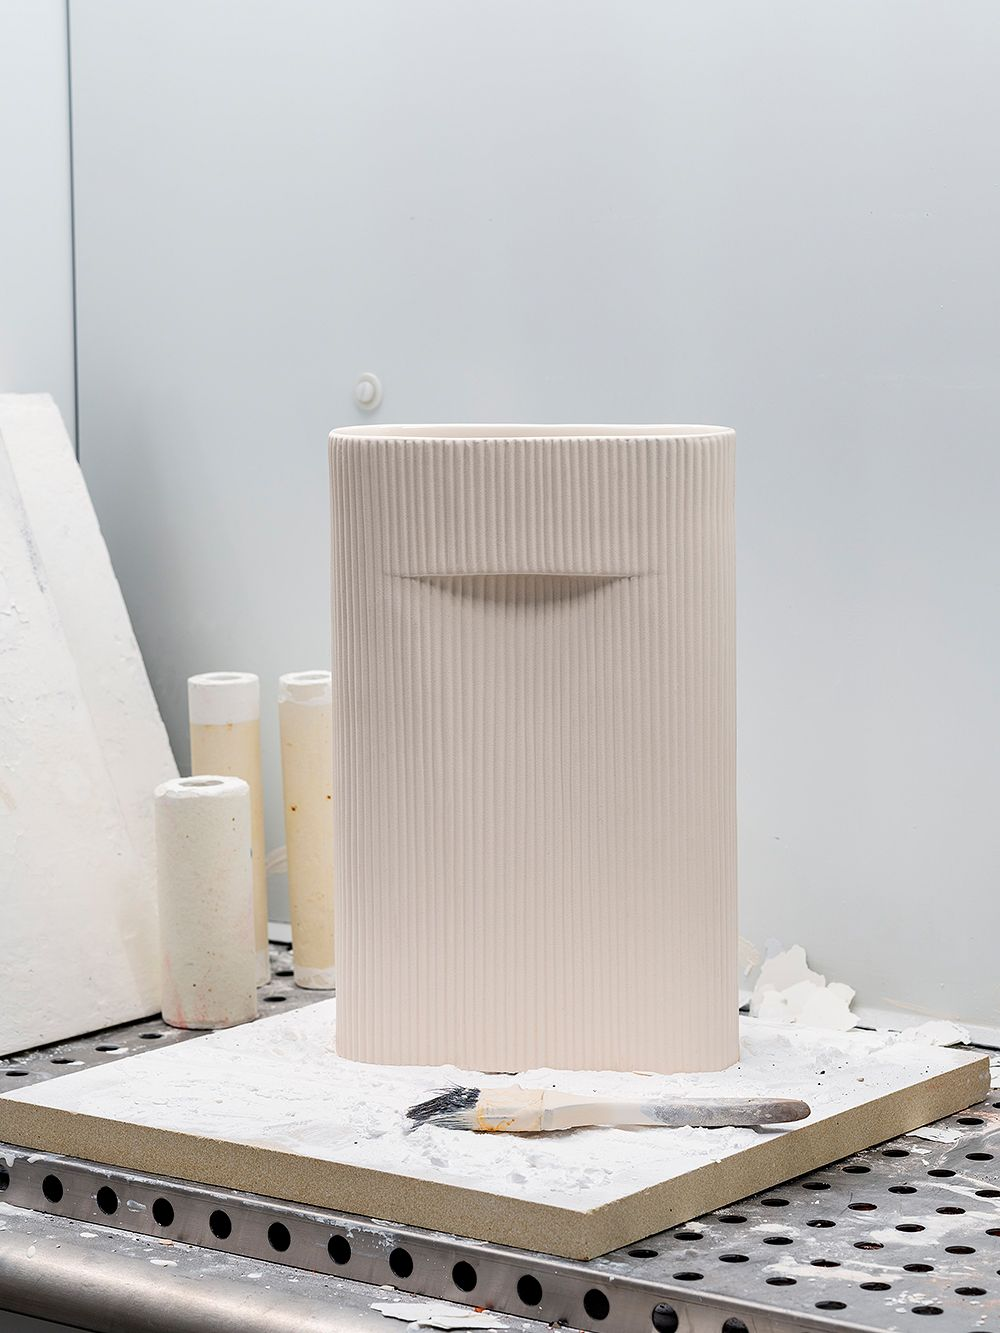 The prototype of Muuto's Ridge vase